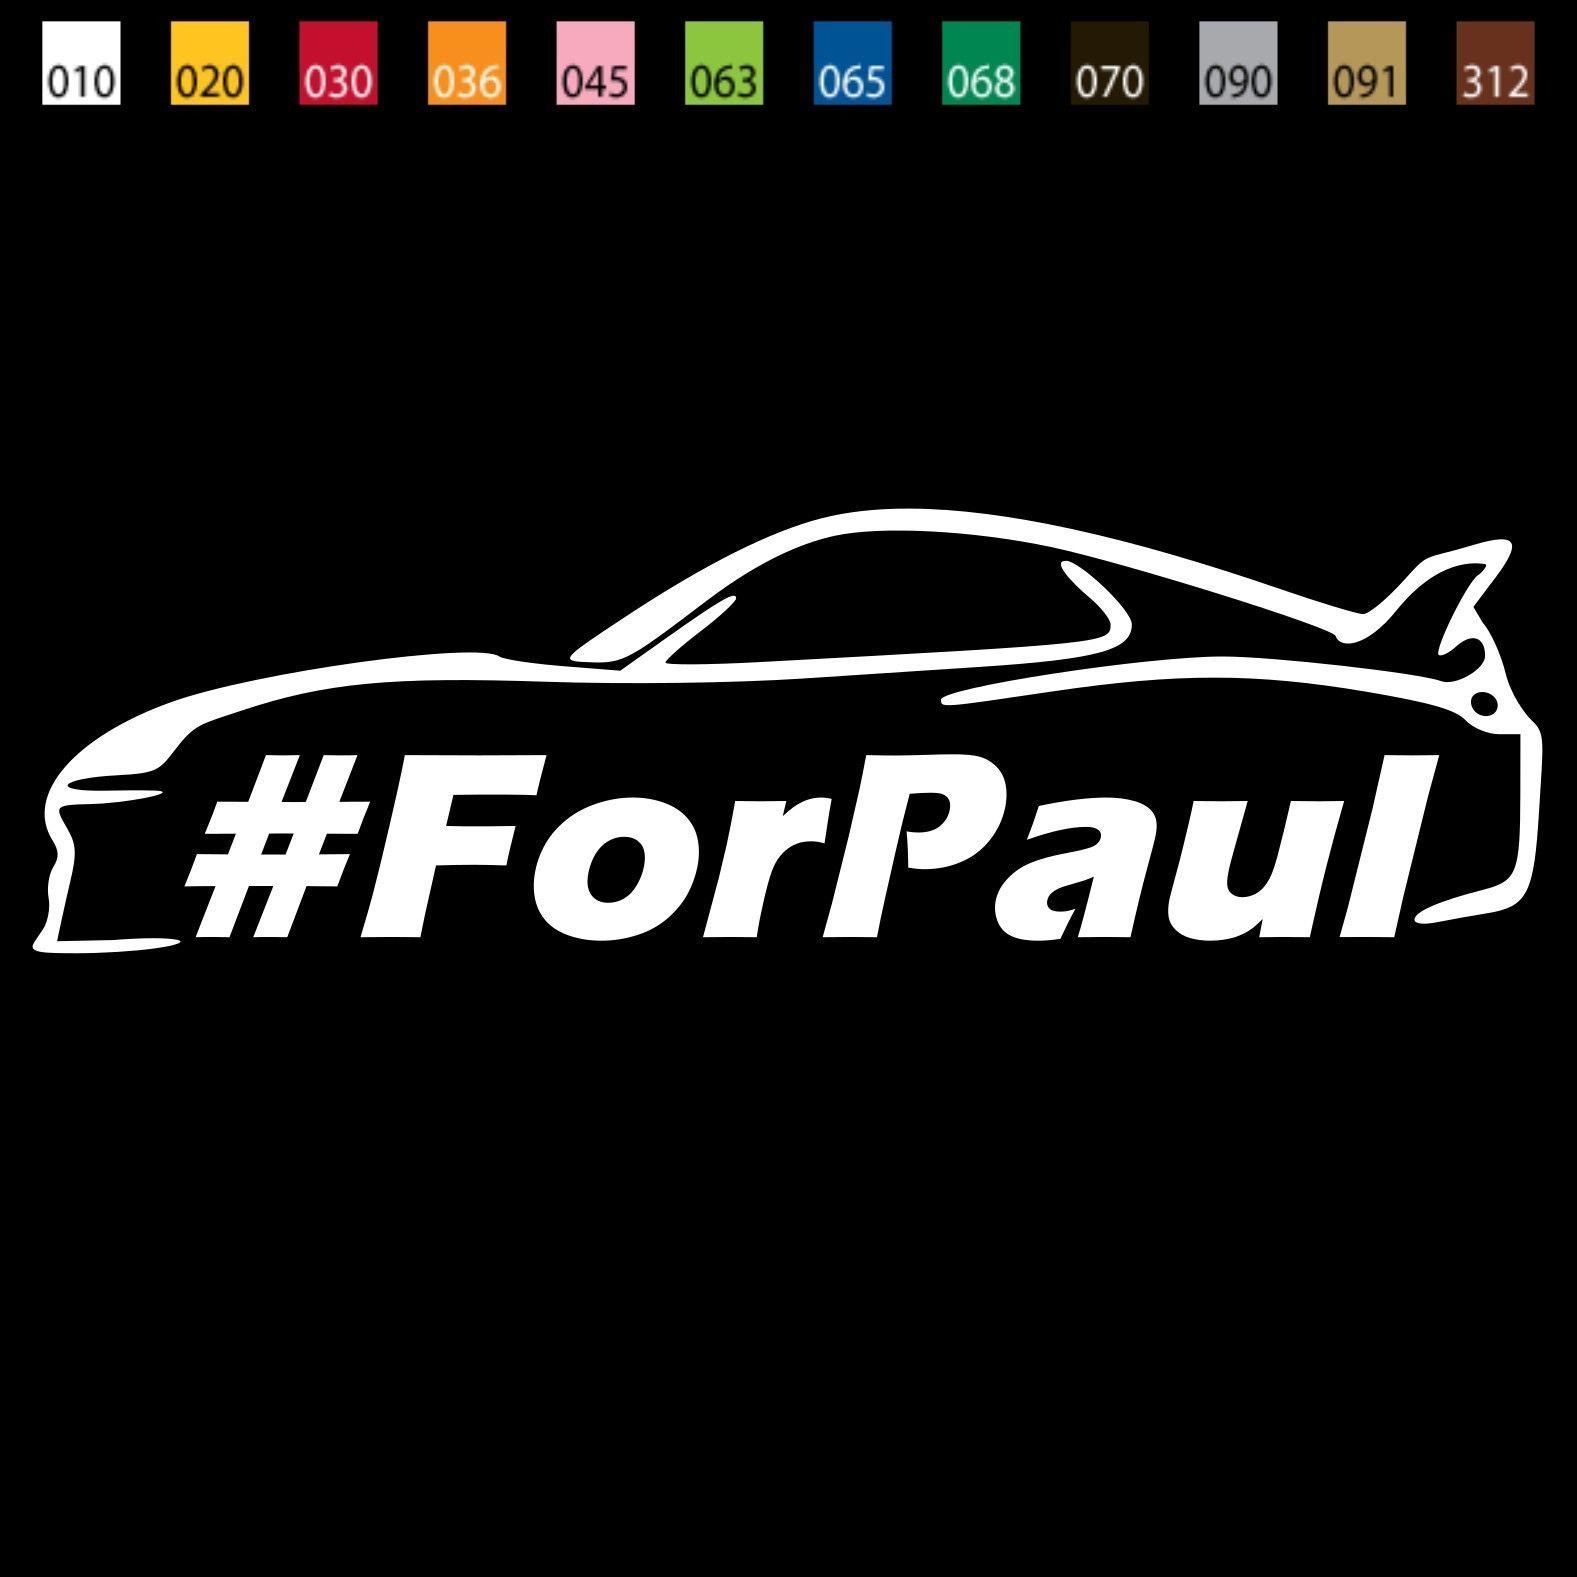 One Last Ride For Rip Paul Walker Supra Car Window Vinyl Decal Sticker Pw003 Car Sticker Design Paul Walker Car Window Vinyl [ 1577 x 1577 Pixel ]